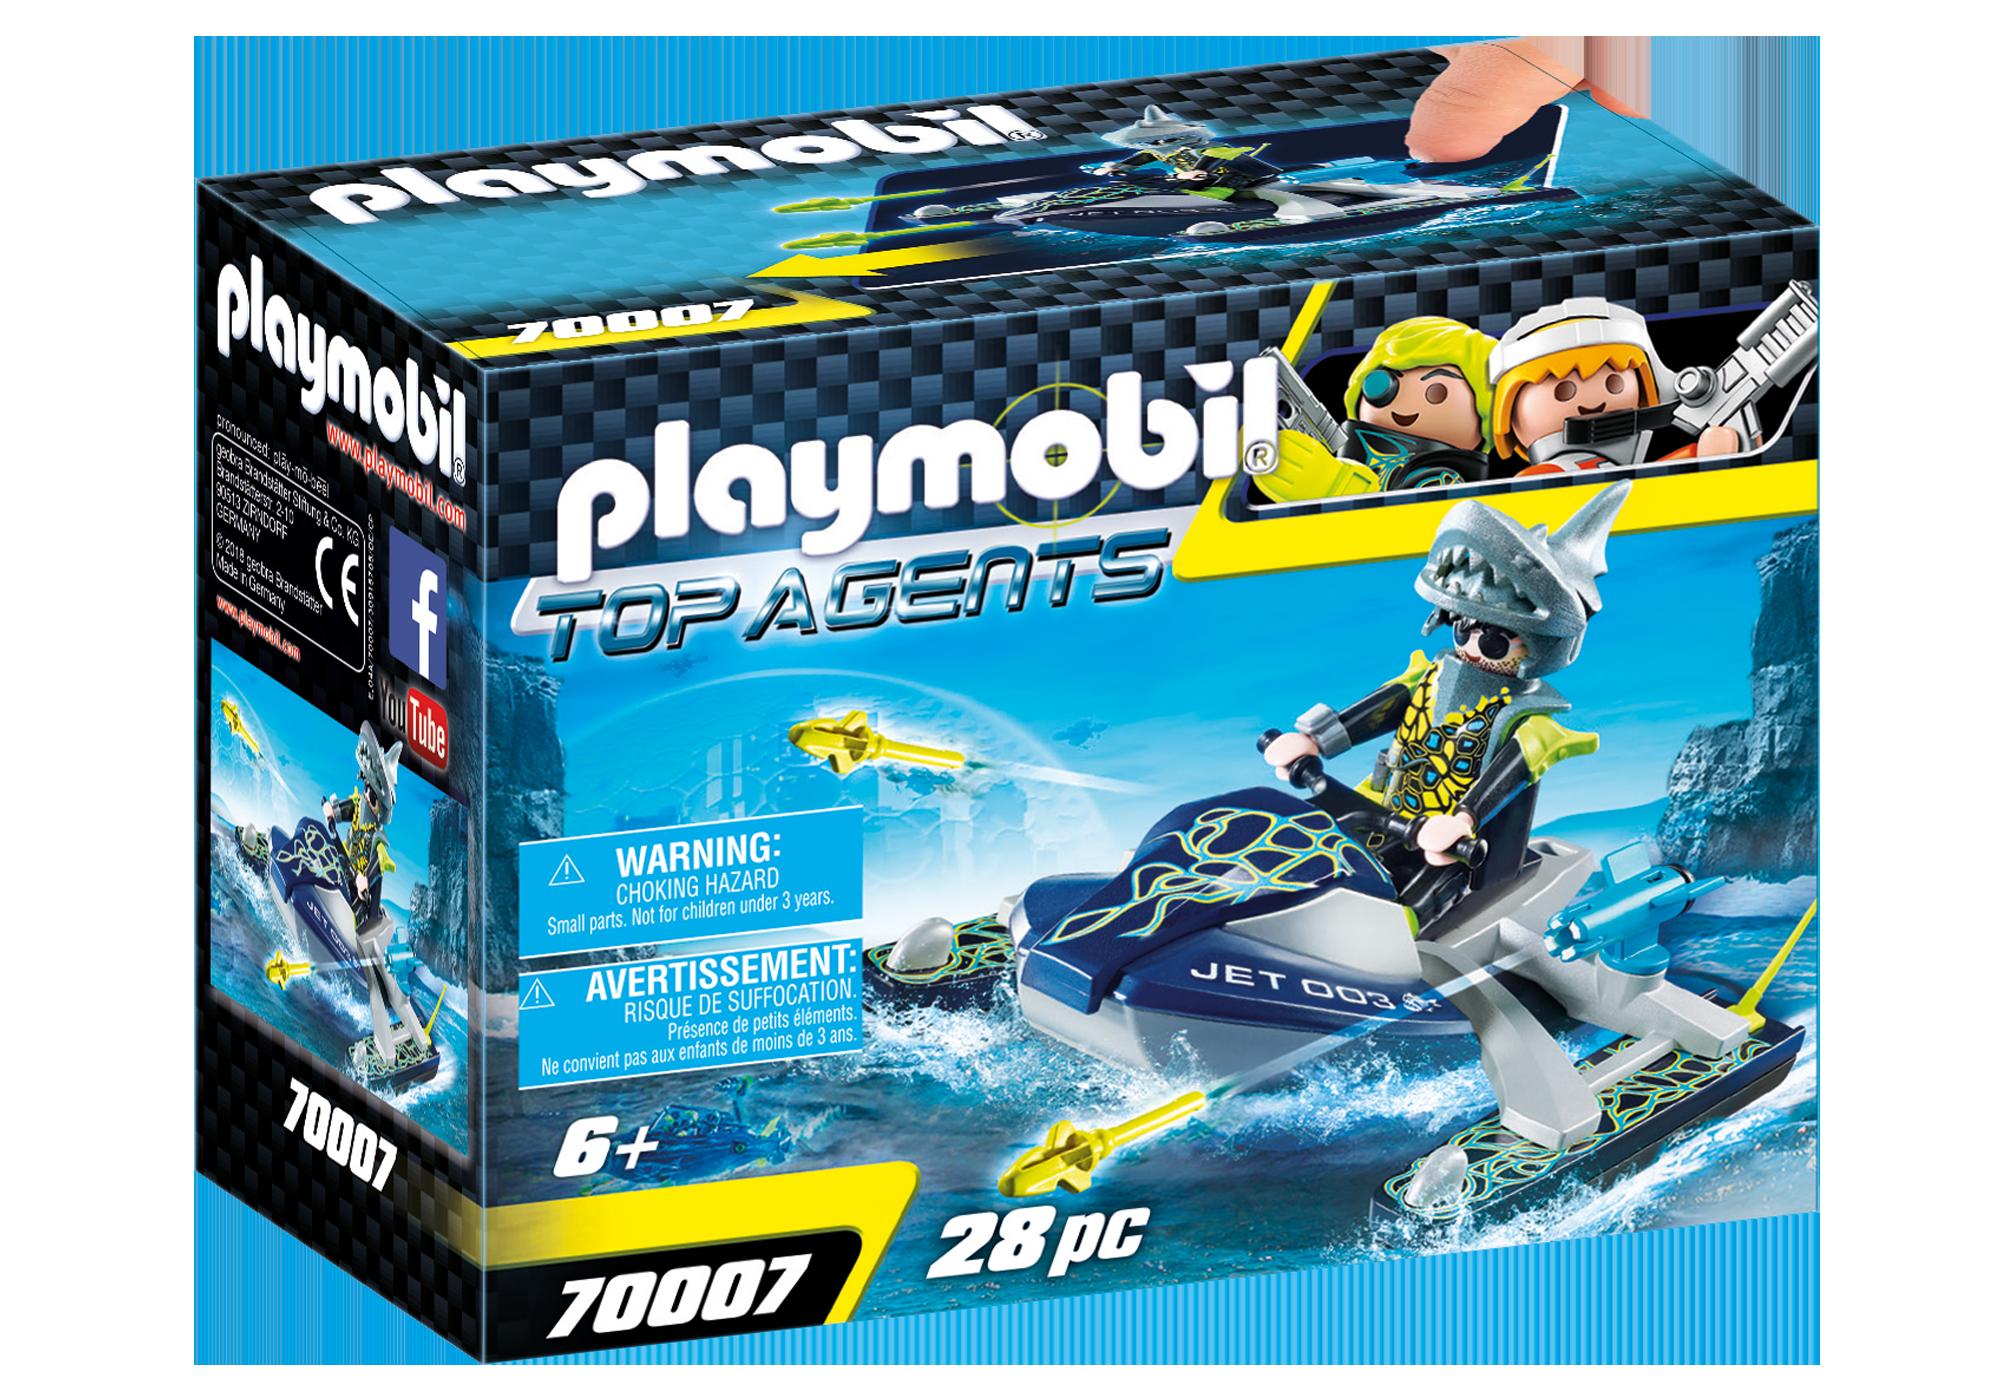 http://media.playmobil.com/i/playmobil/70007_product_box_front/TEAM S.H.A.R.K. Raketflotte